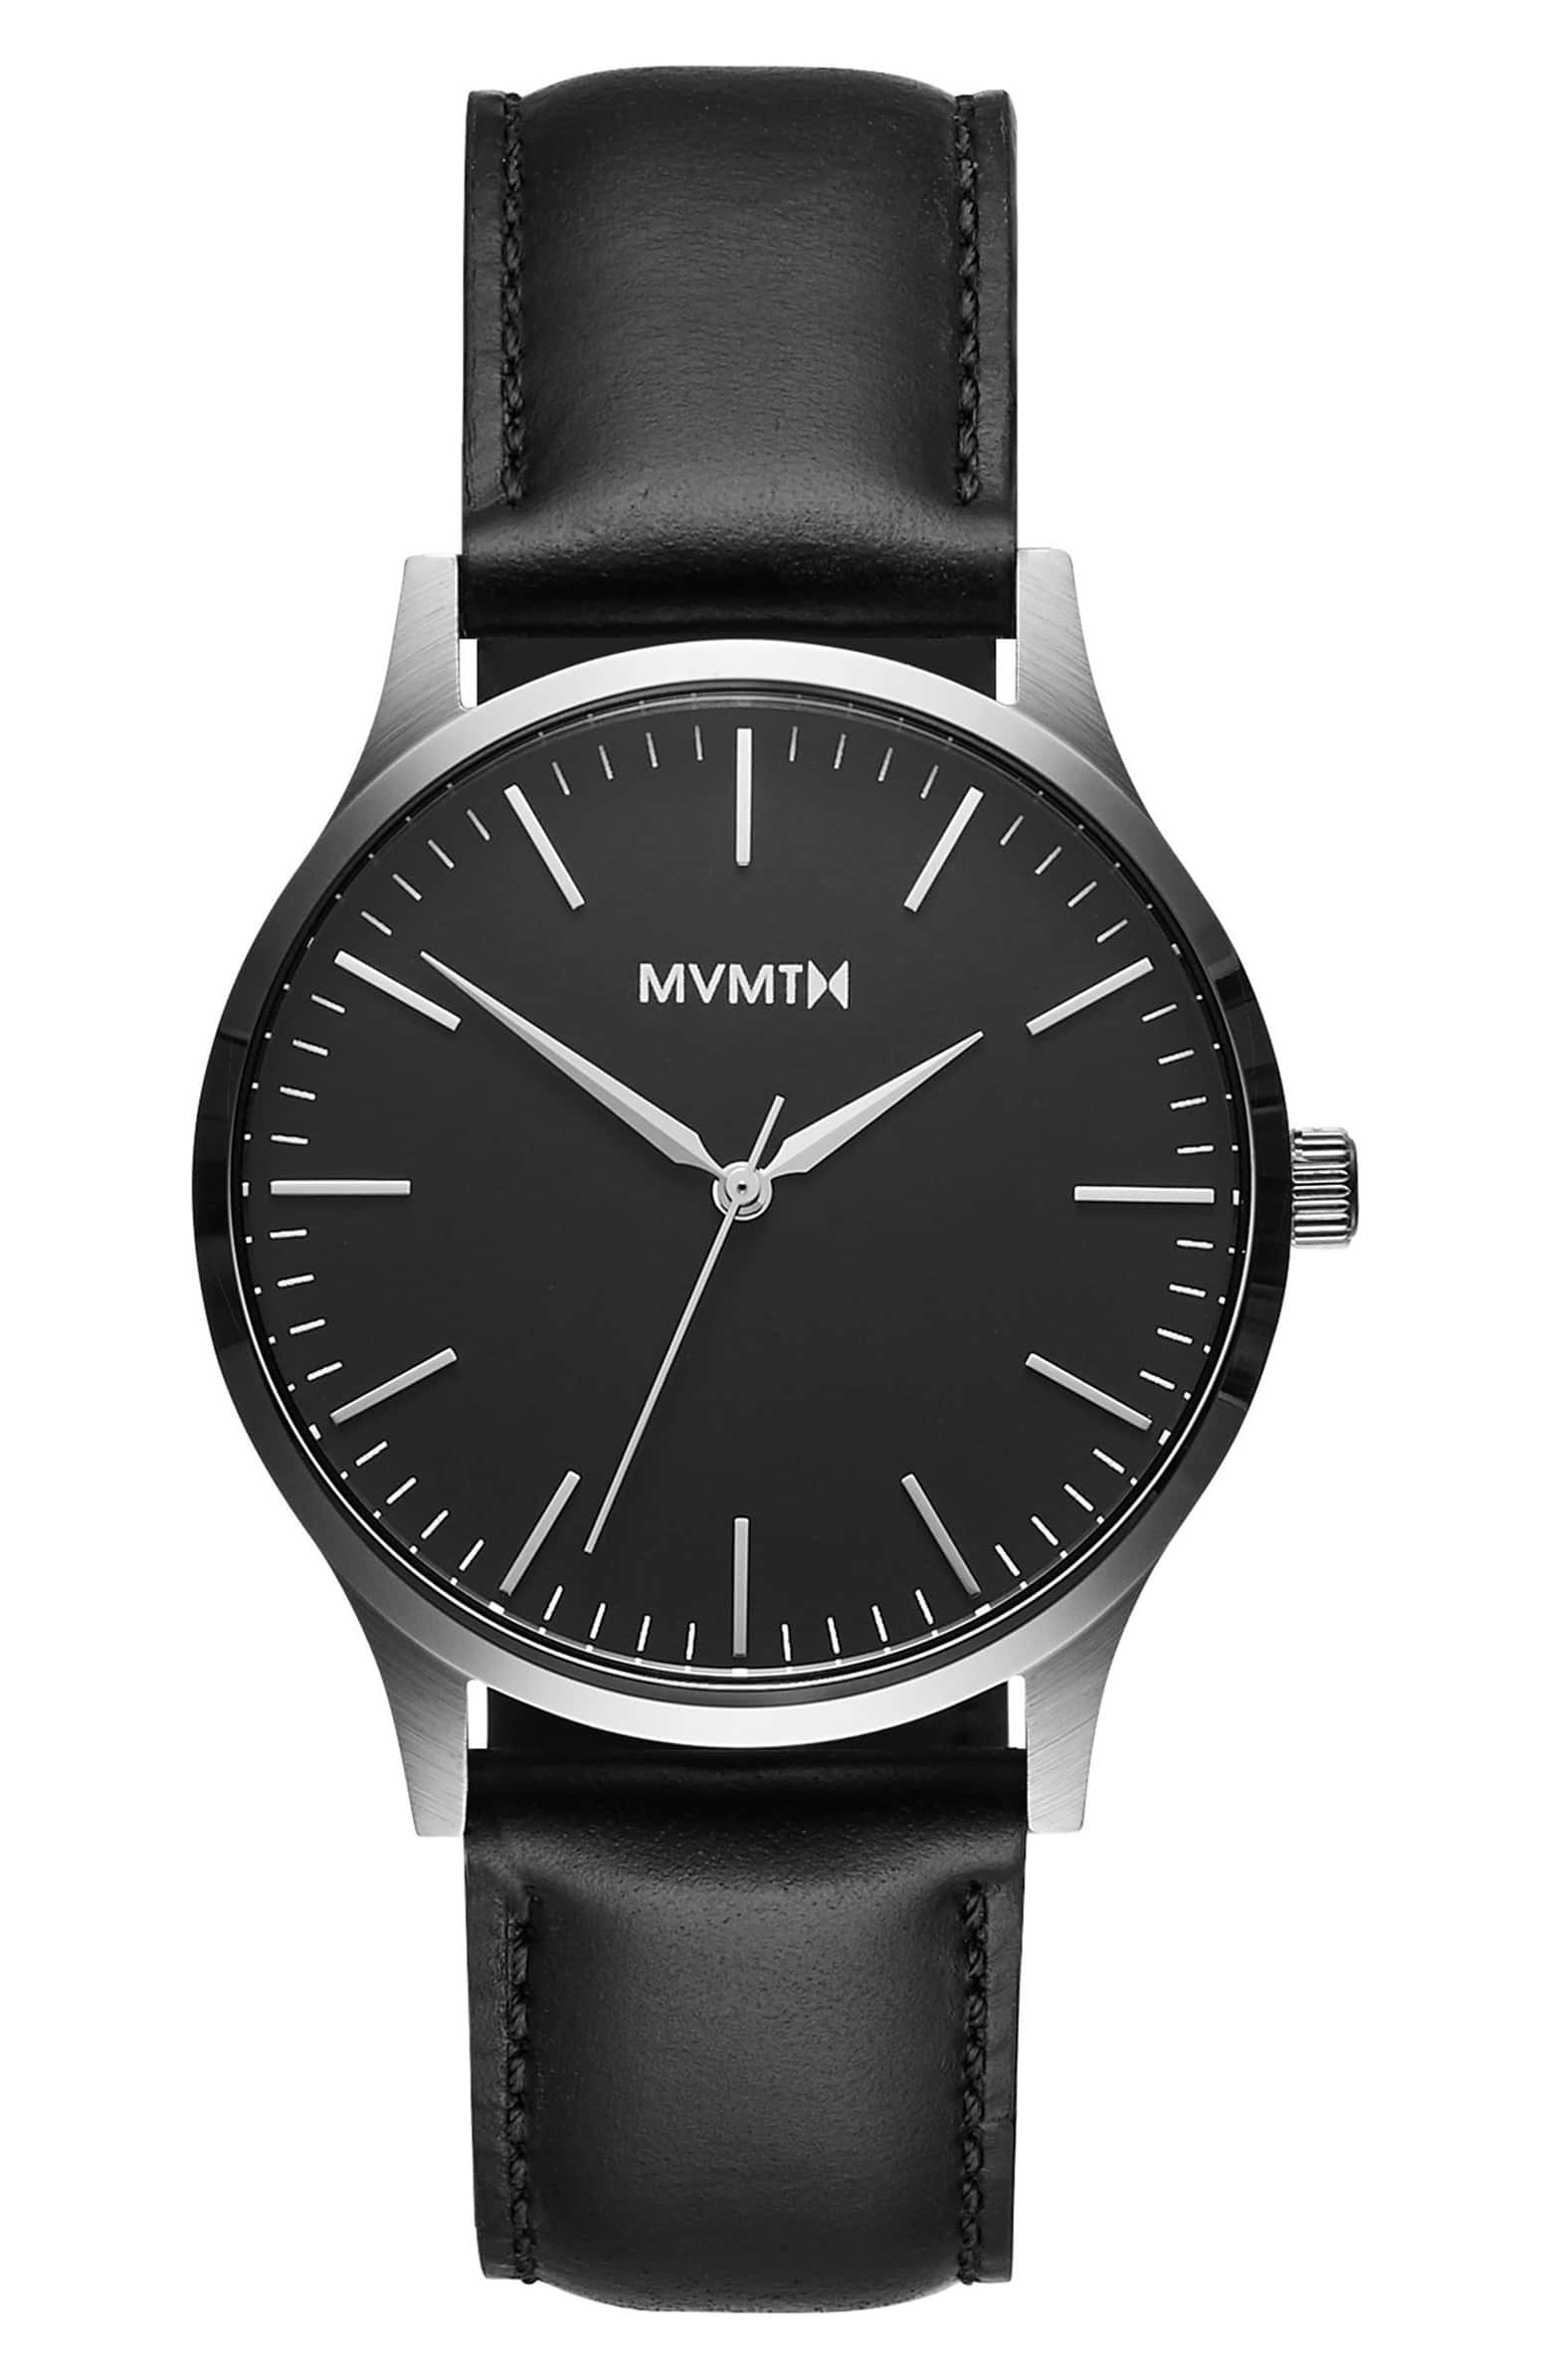 mvmt black leather watch.jpeg